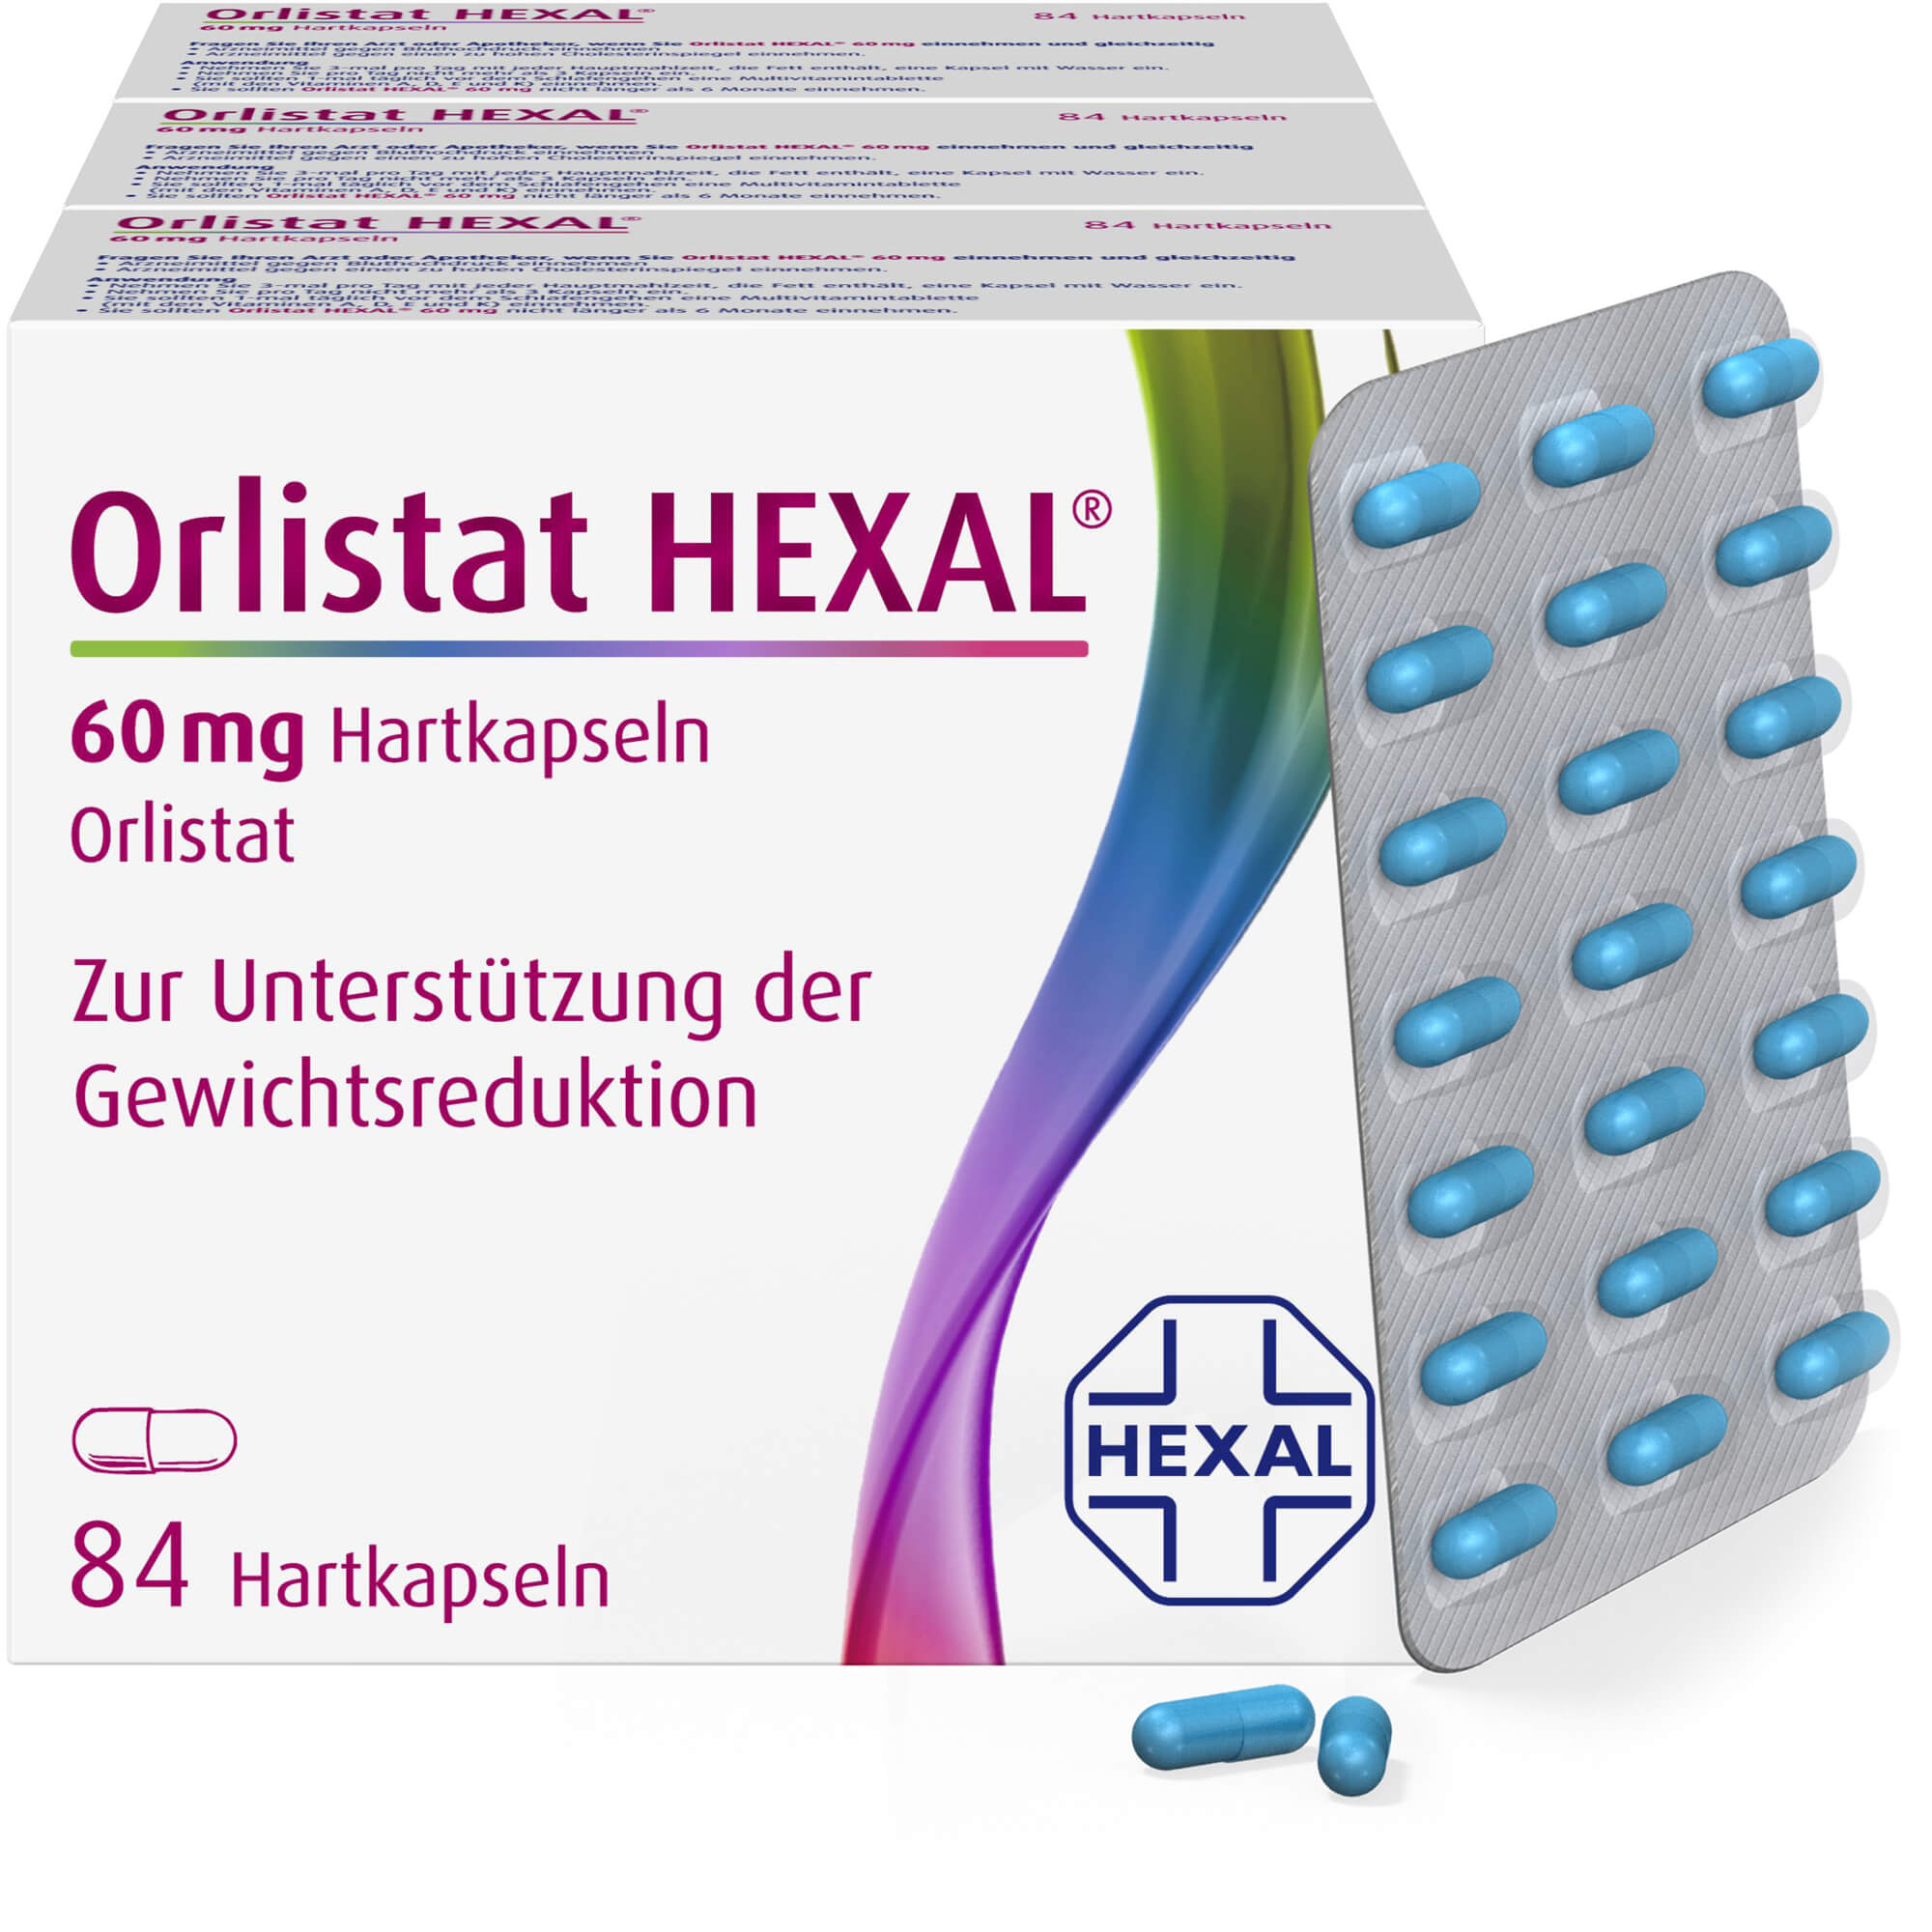 ORLISTAT-HEXAL-60-mg-Hartkapseln